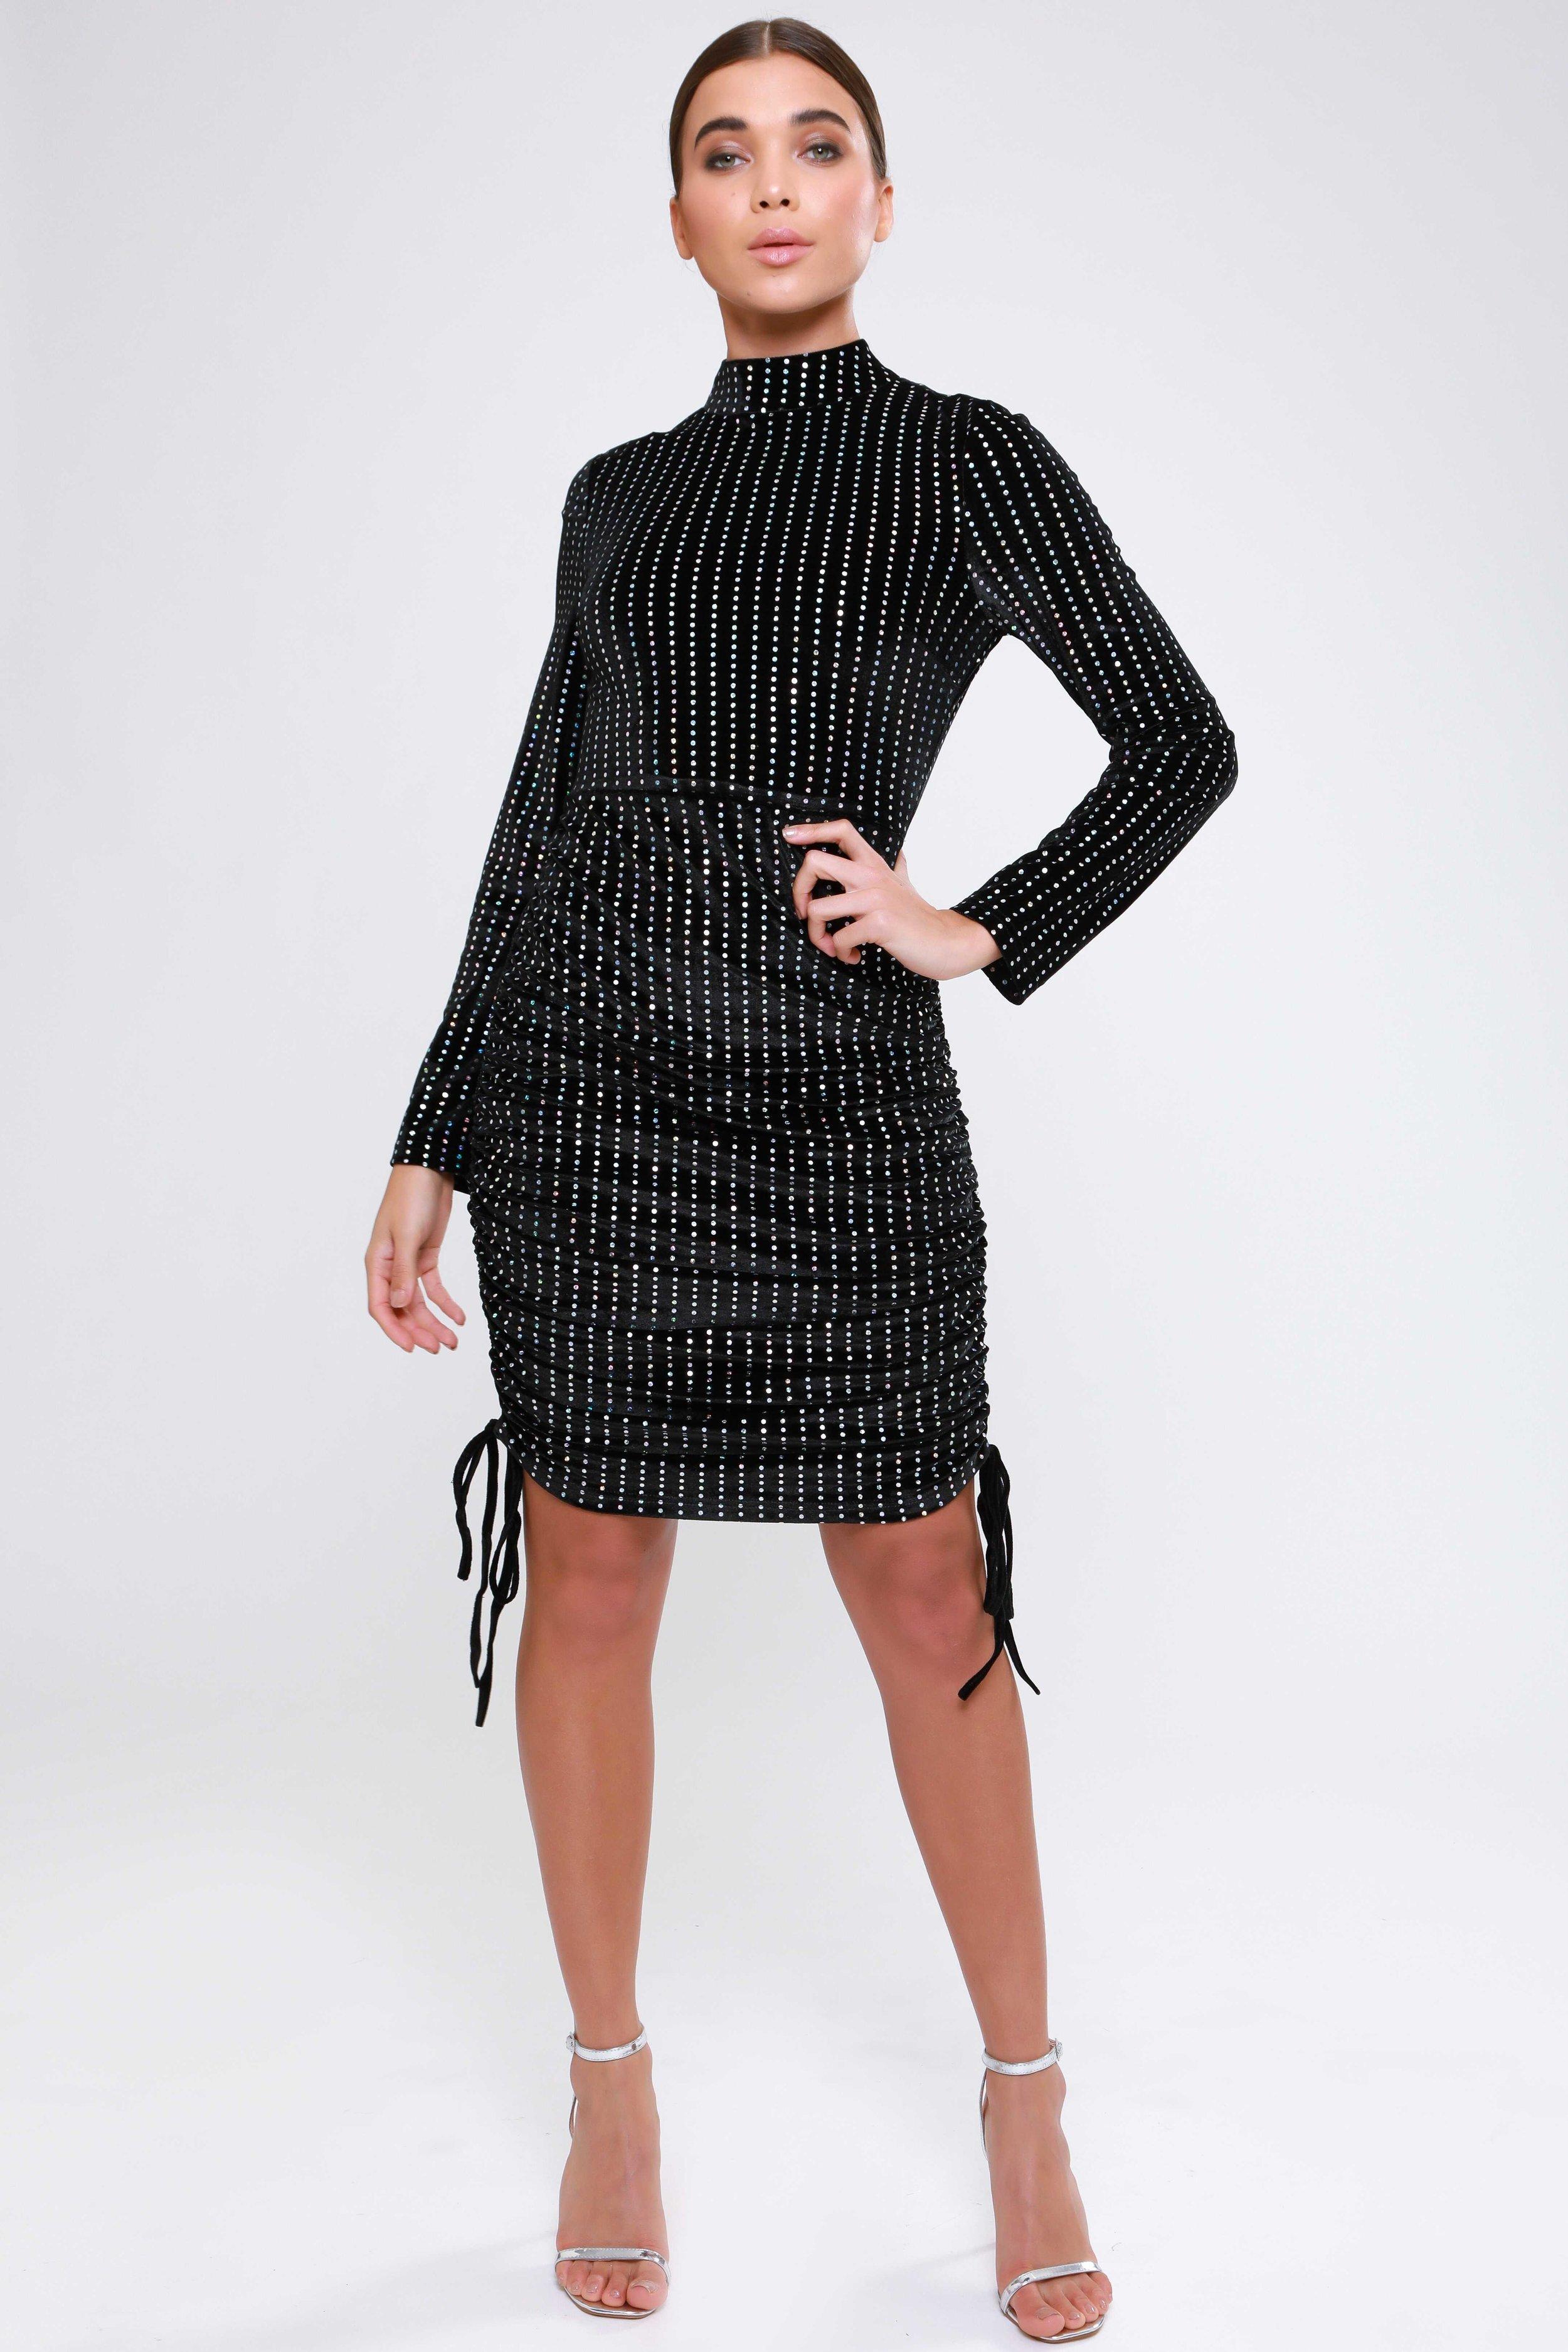 Metallic Mirrored Velvet  Midi Dress   £65.00